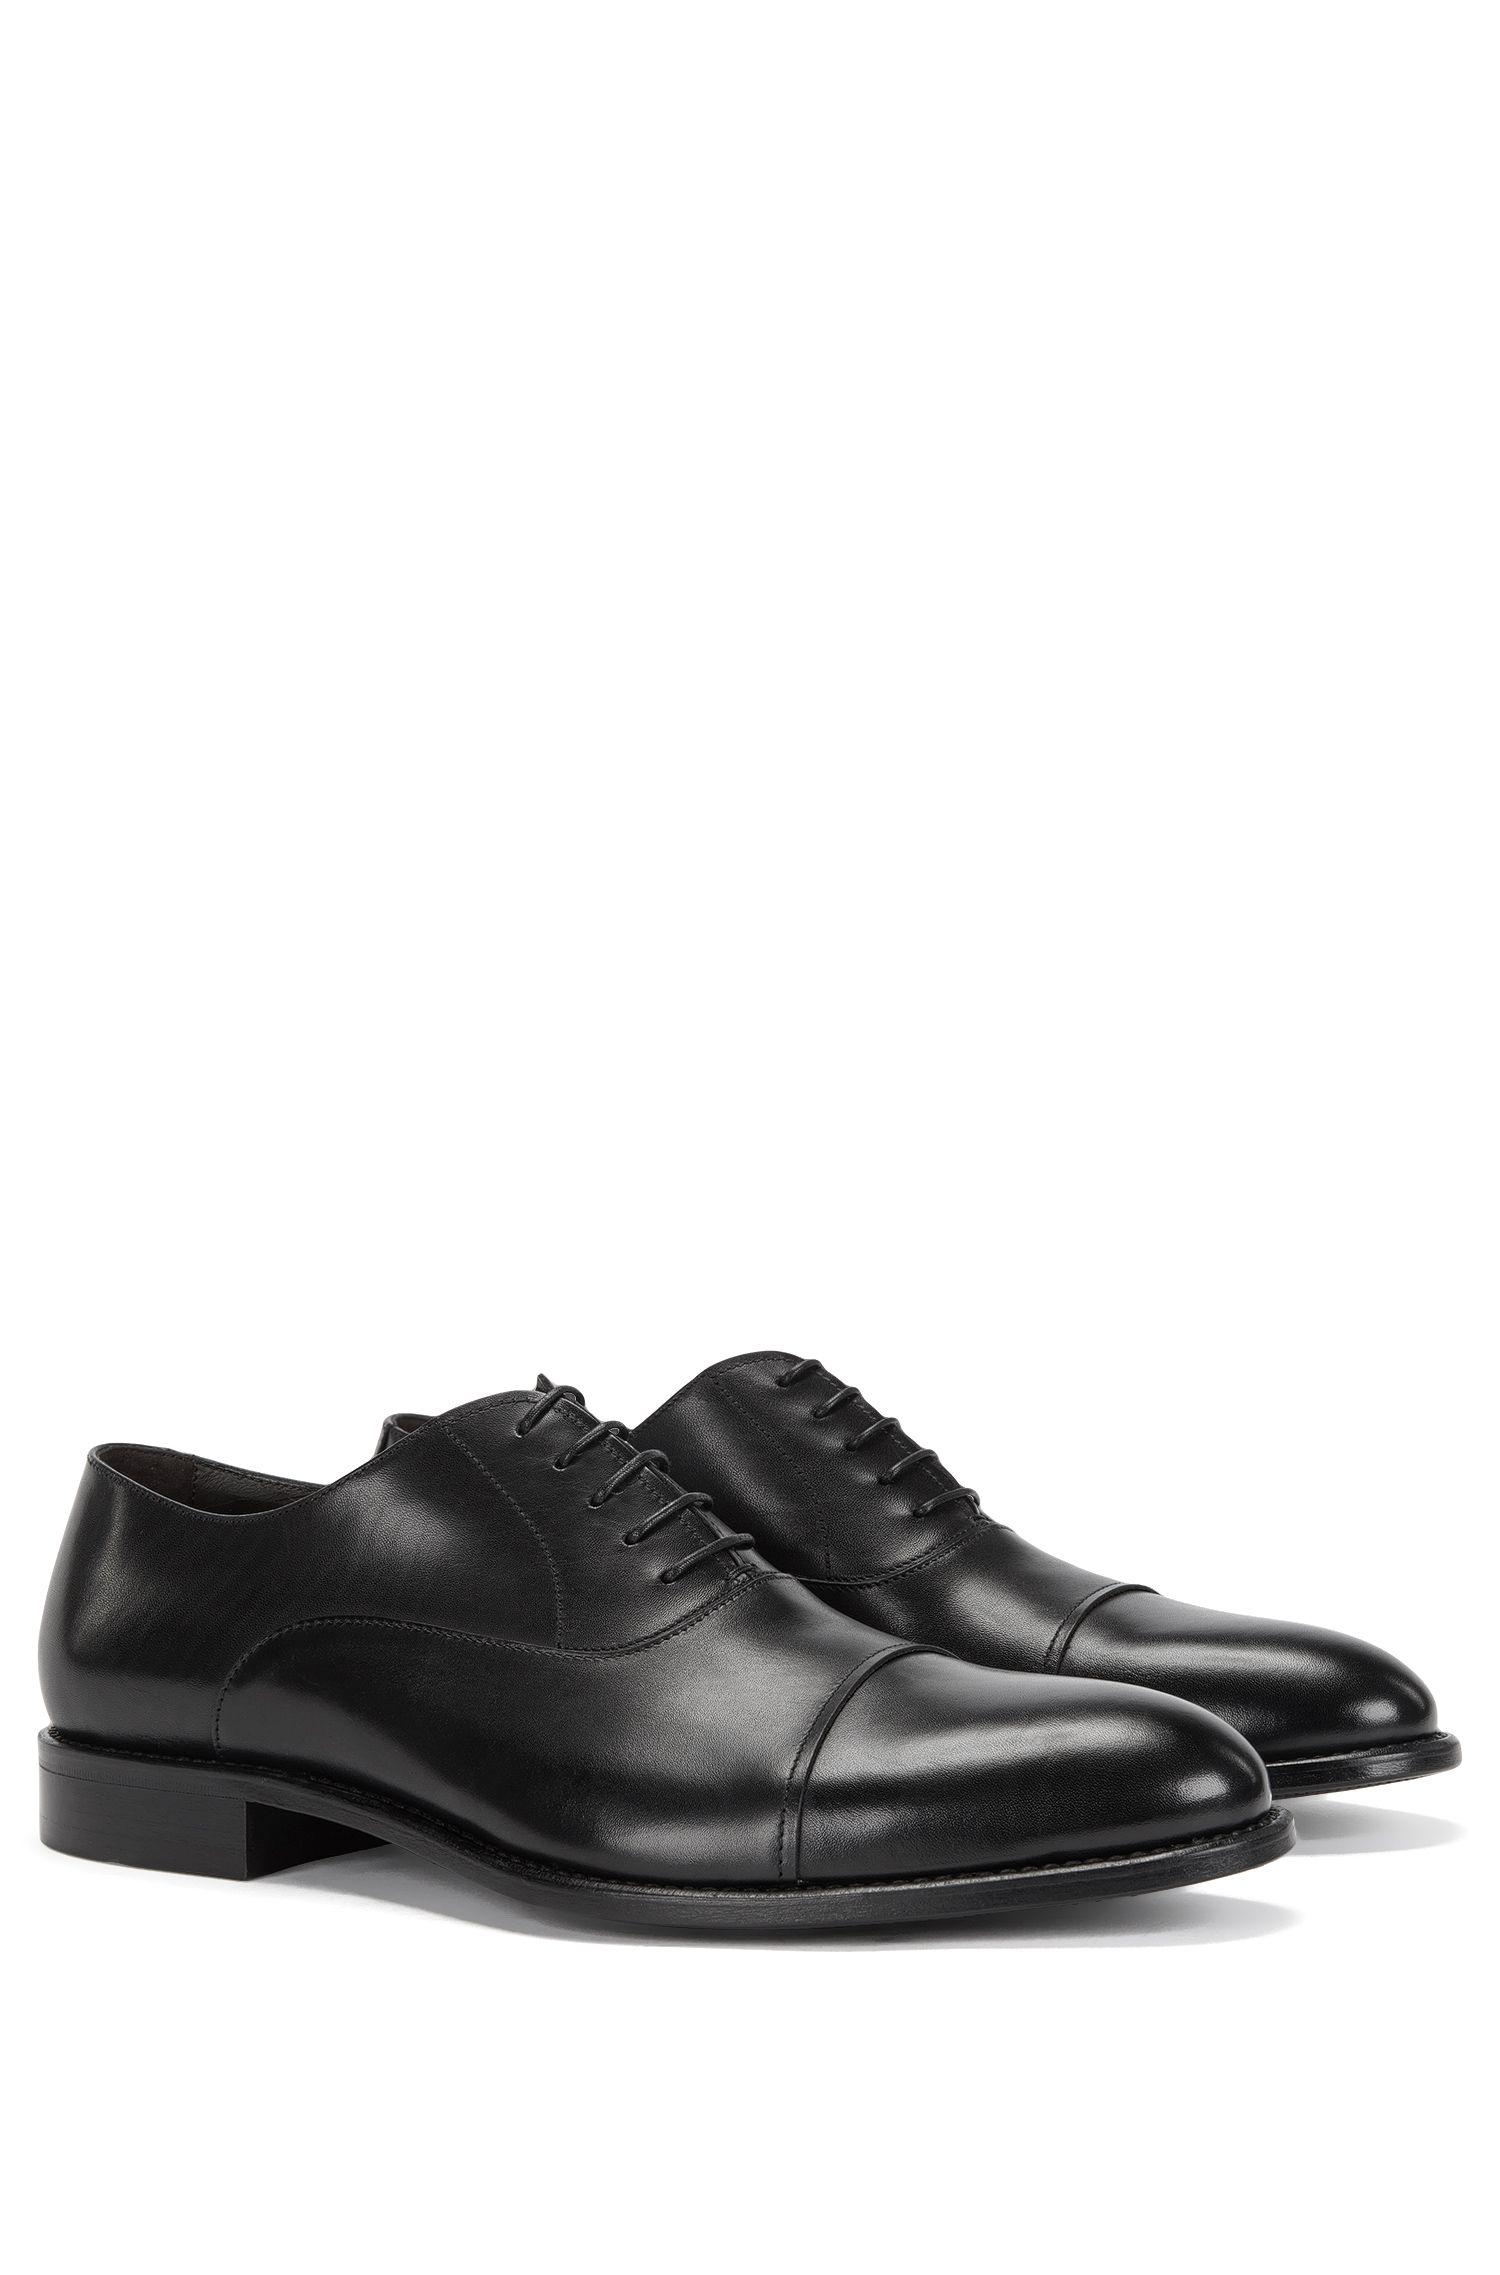 'Stockholm Oxfr Itct' | Italian Calfskin Cap Toe Dress Shoes